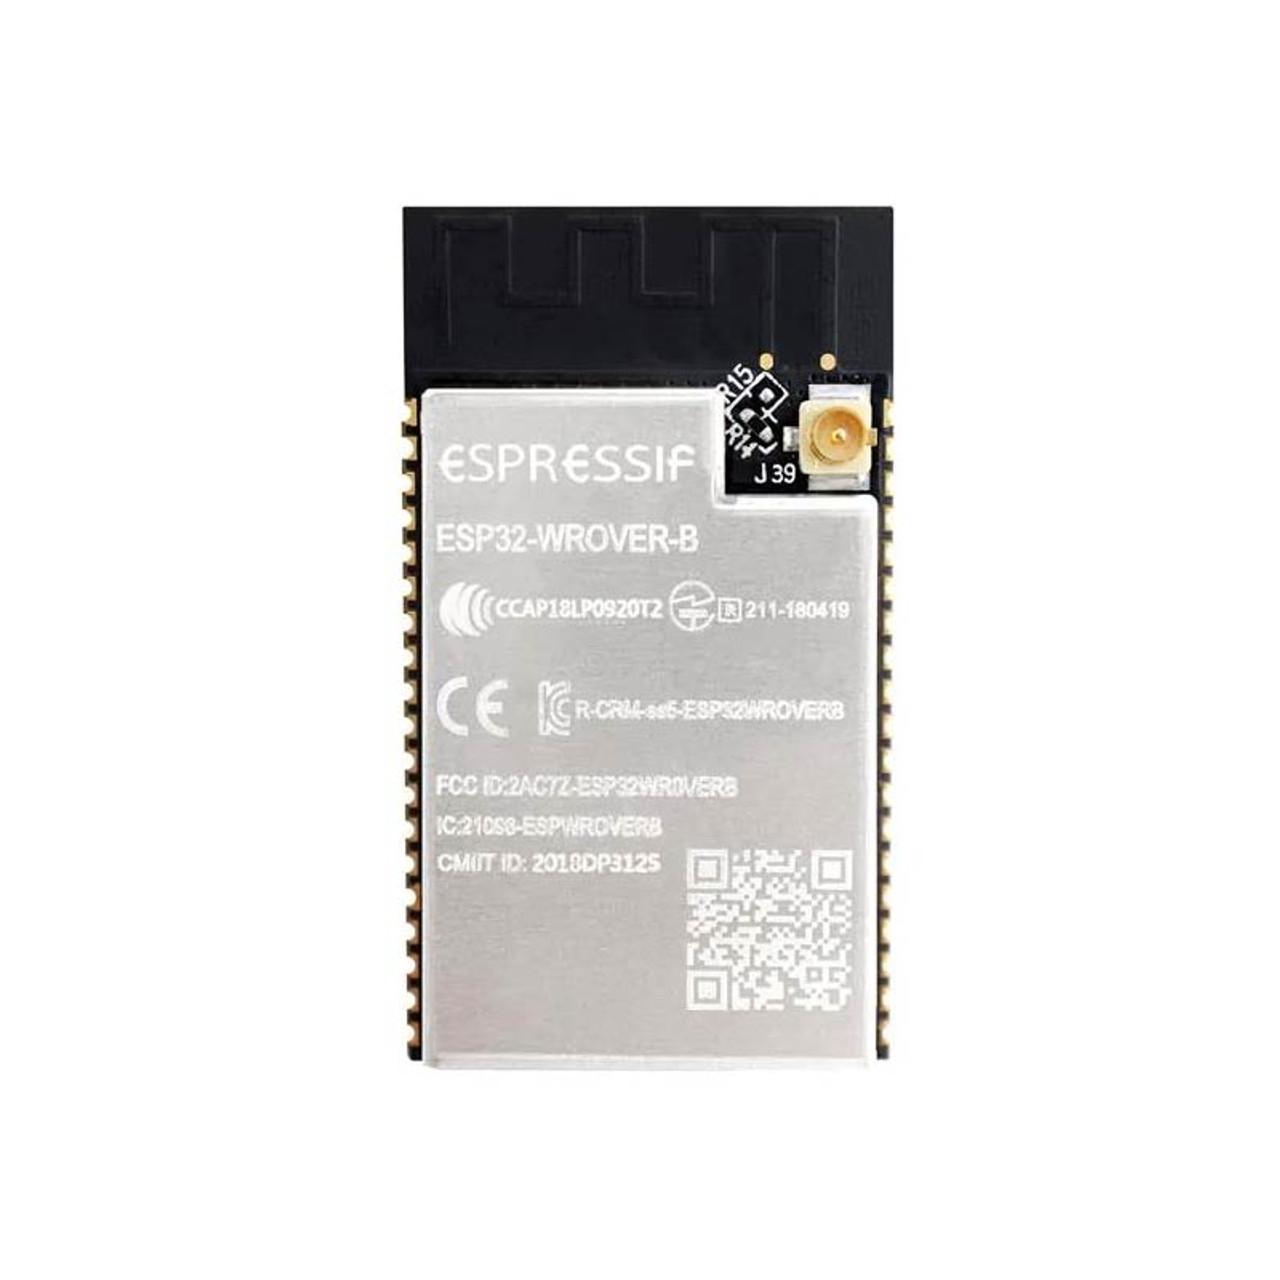 WiFi ESP32-WROVER-I Module IPEX Antenna//WIFI+Bluetooth//4MB FLASH And 8MB PSRAM